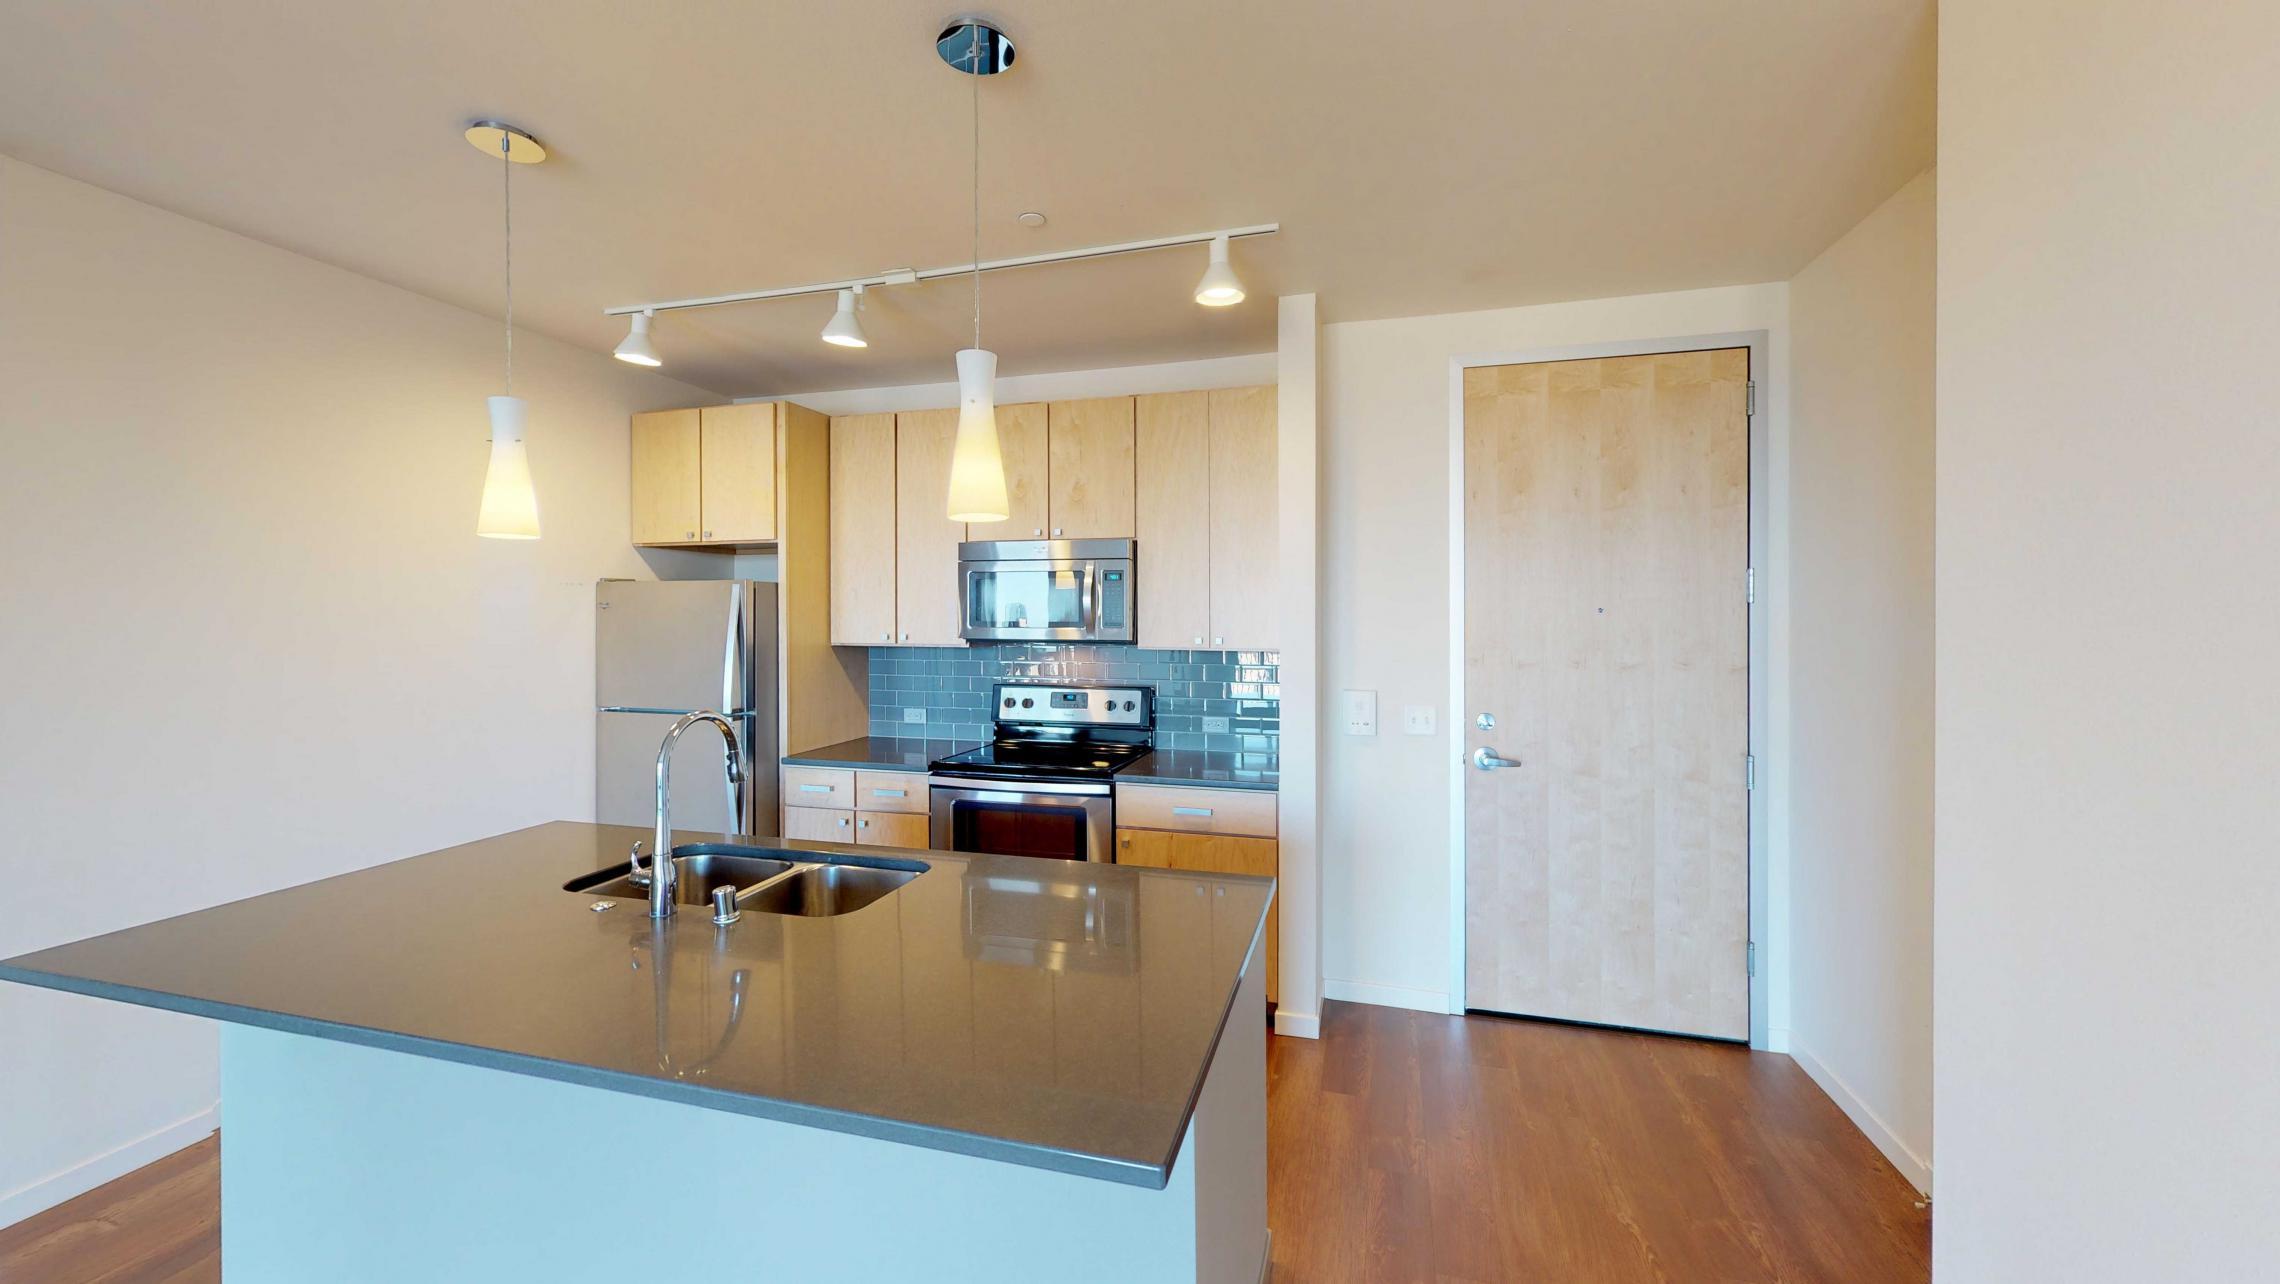 Nine-Line-Apartment-517-kitchen-appliances-moder-lake-view-downtown-captiol-madison-lifestyle.jpg